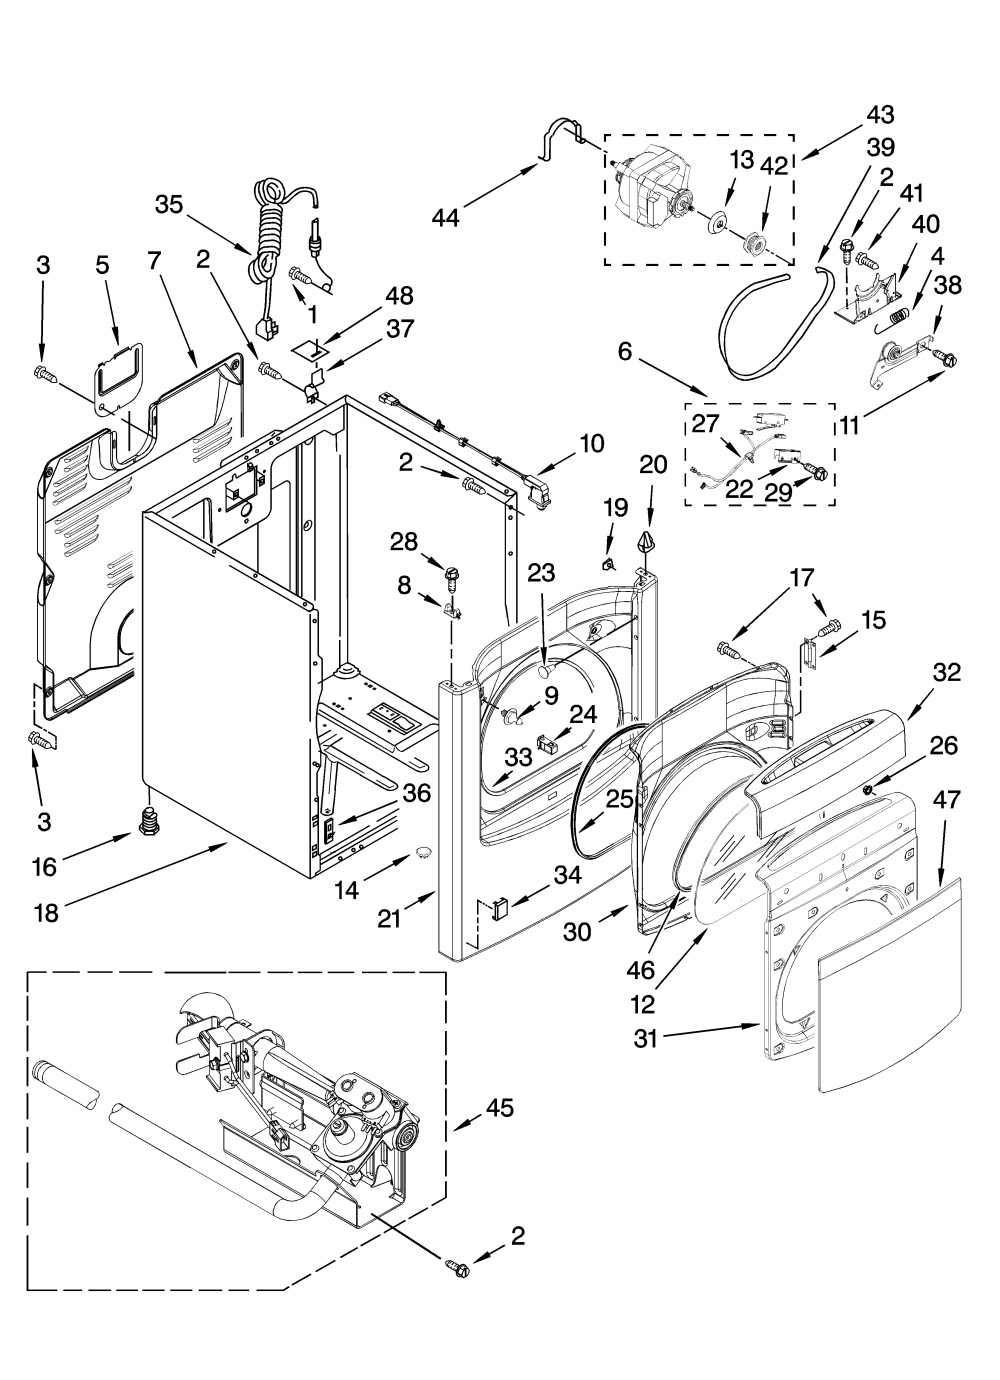 medium resolution of whirlpool wgd6400sb0 cabinet parts diagram